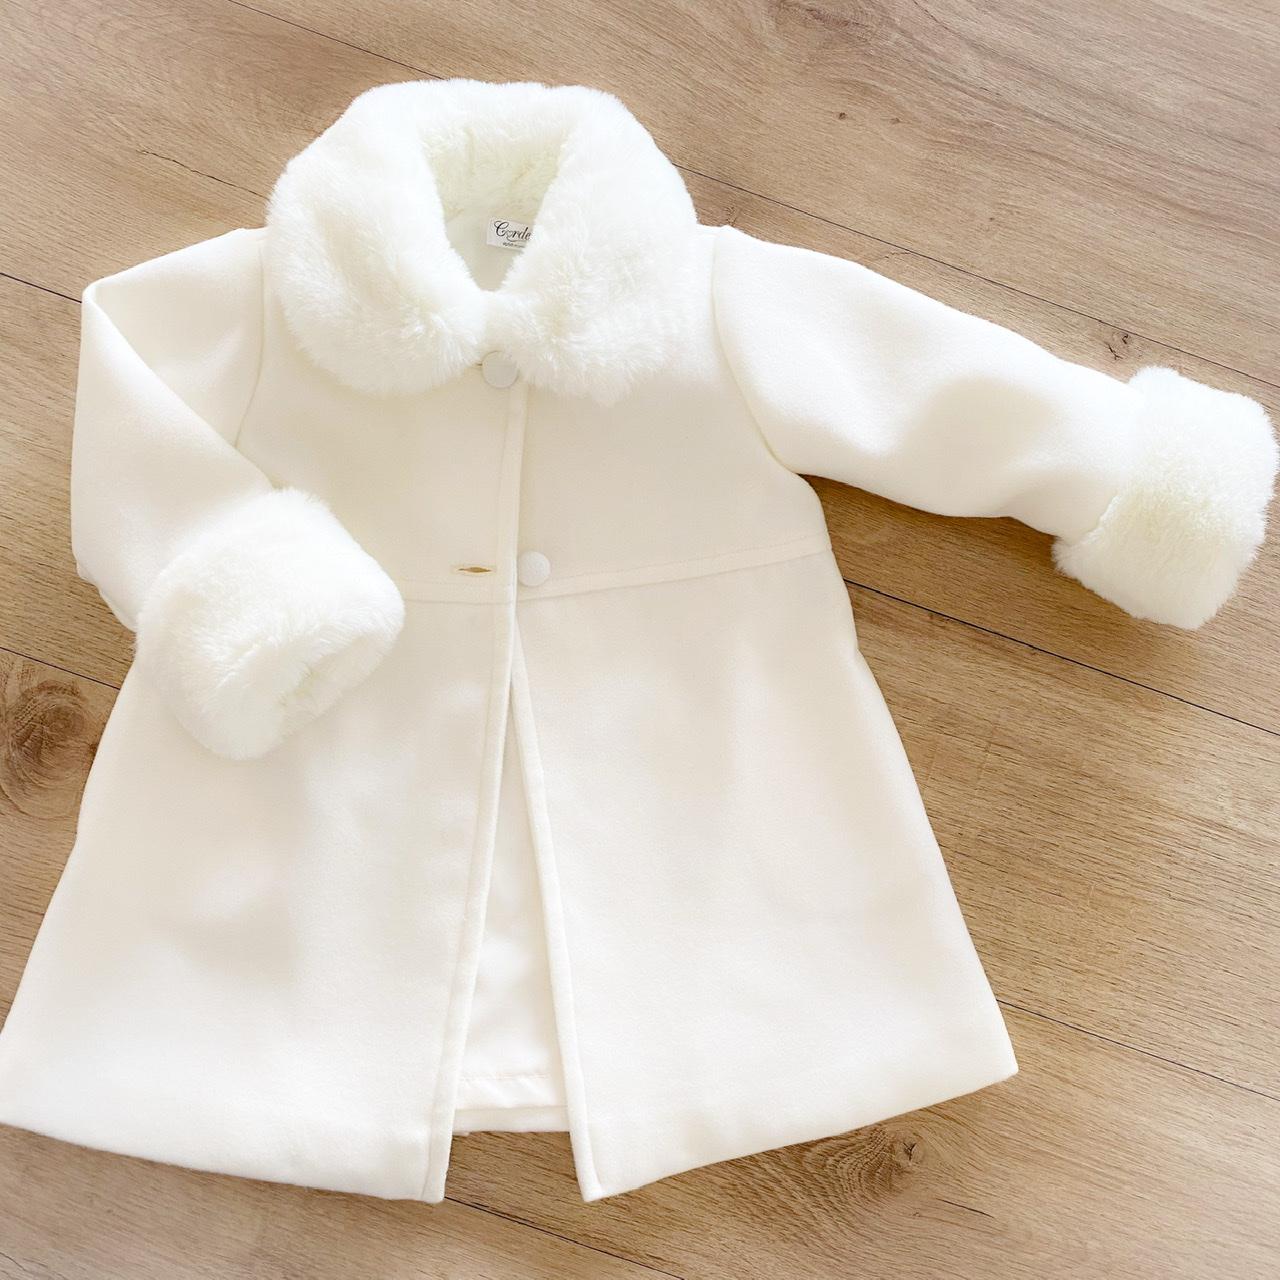 Casaco (Coat)